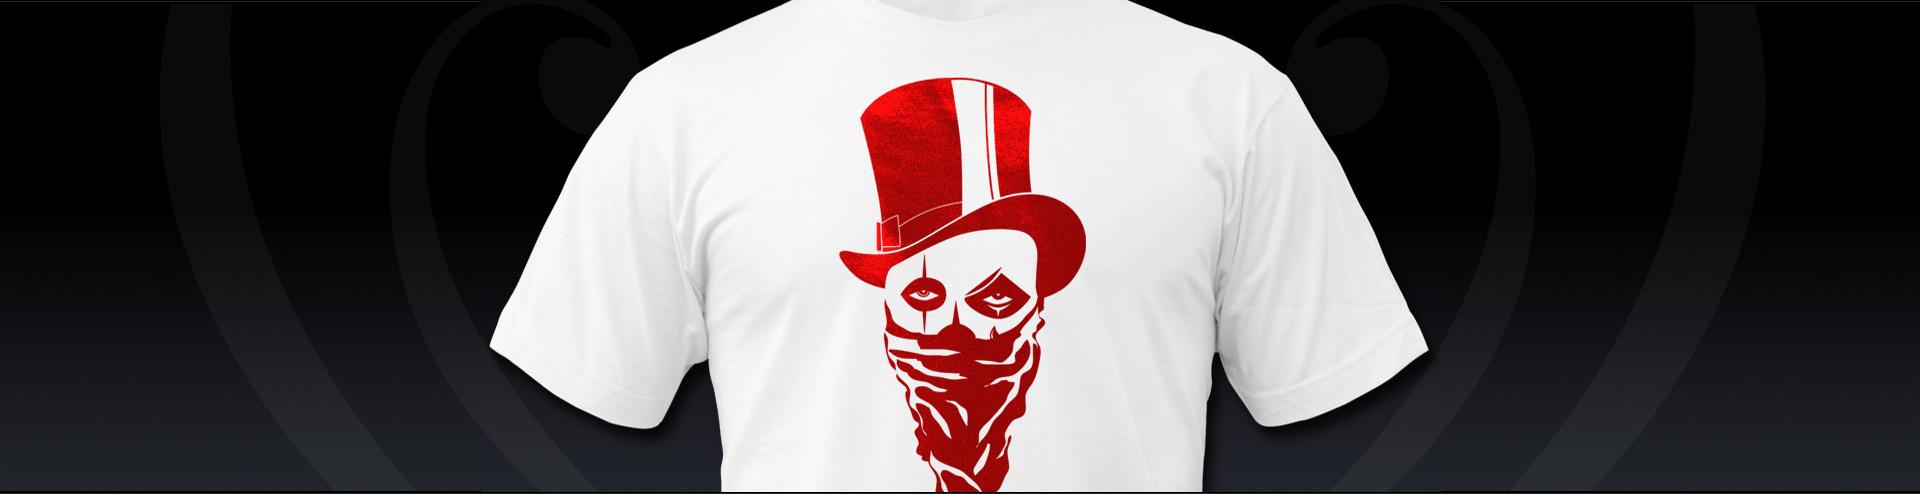 T-shirt Druck Stuttgart Totenkopf metallic